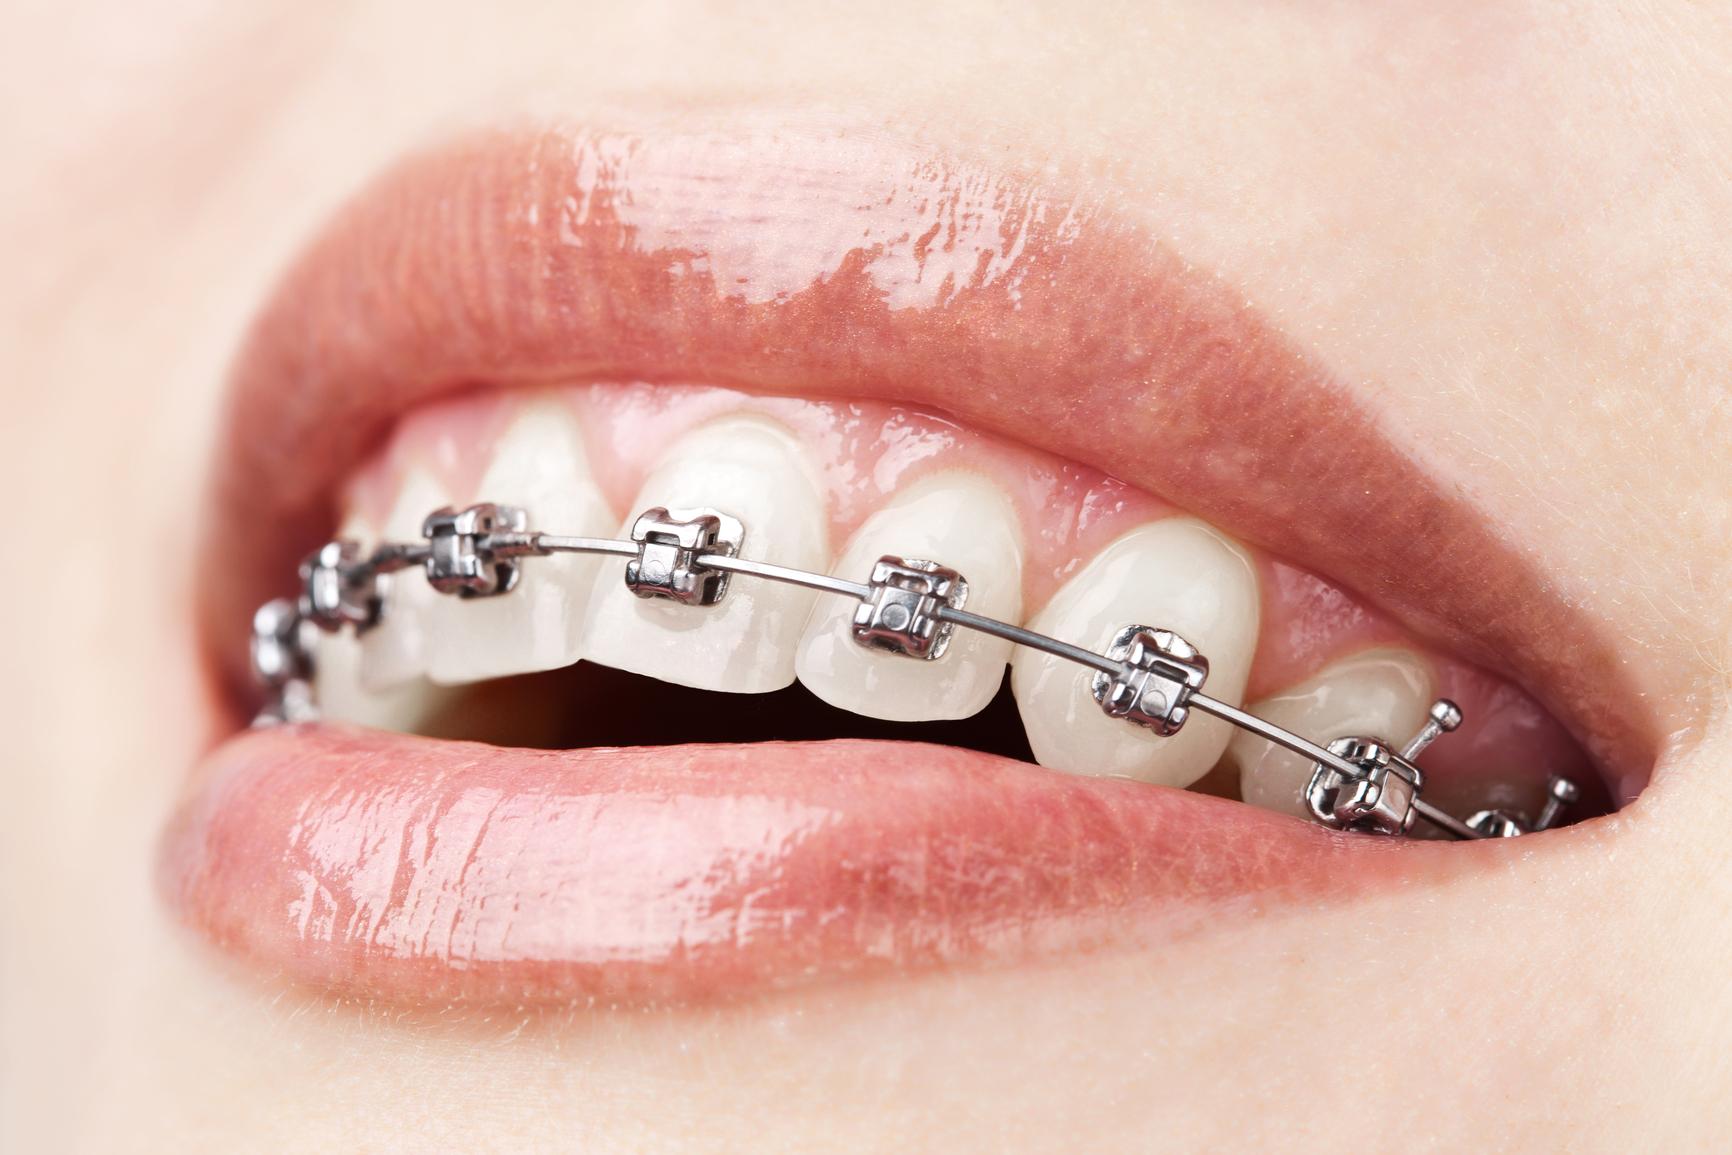 affollamenti dentari apparecchio